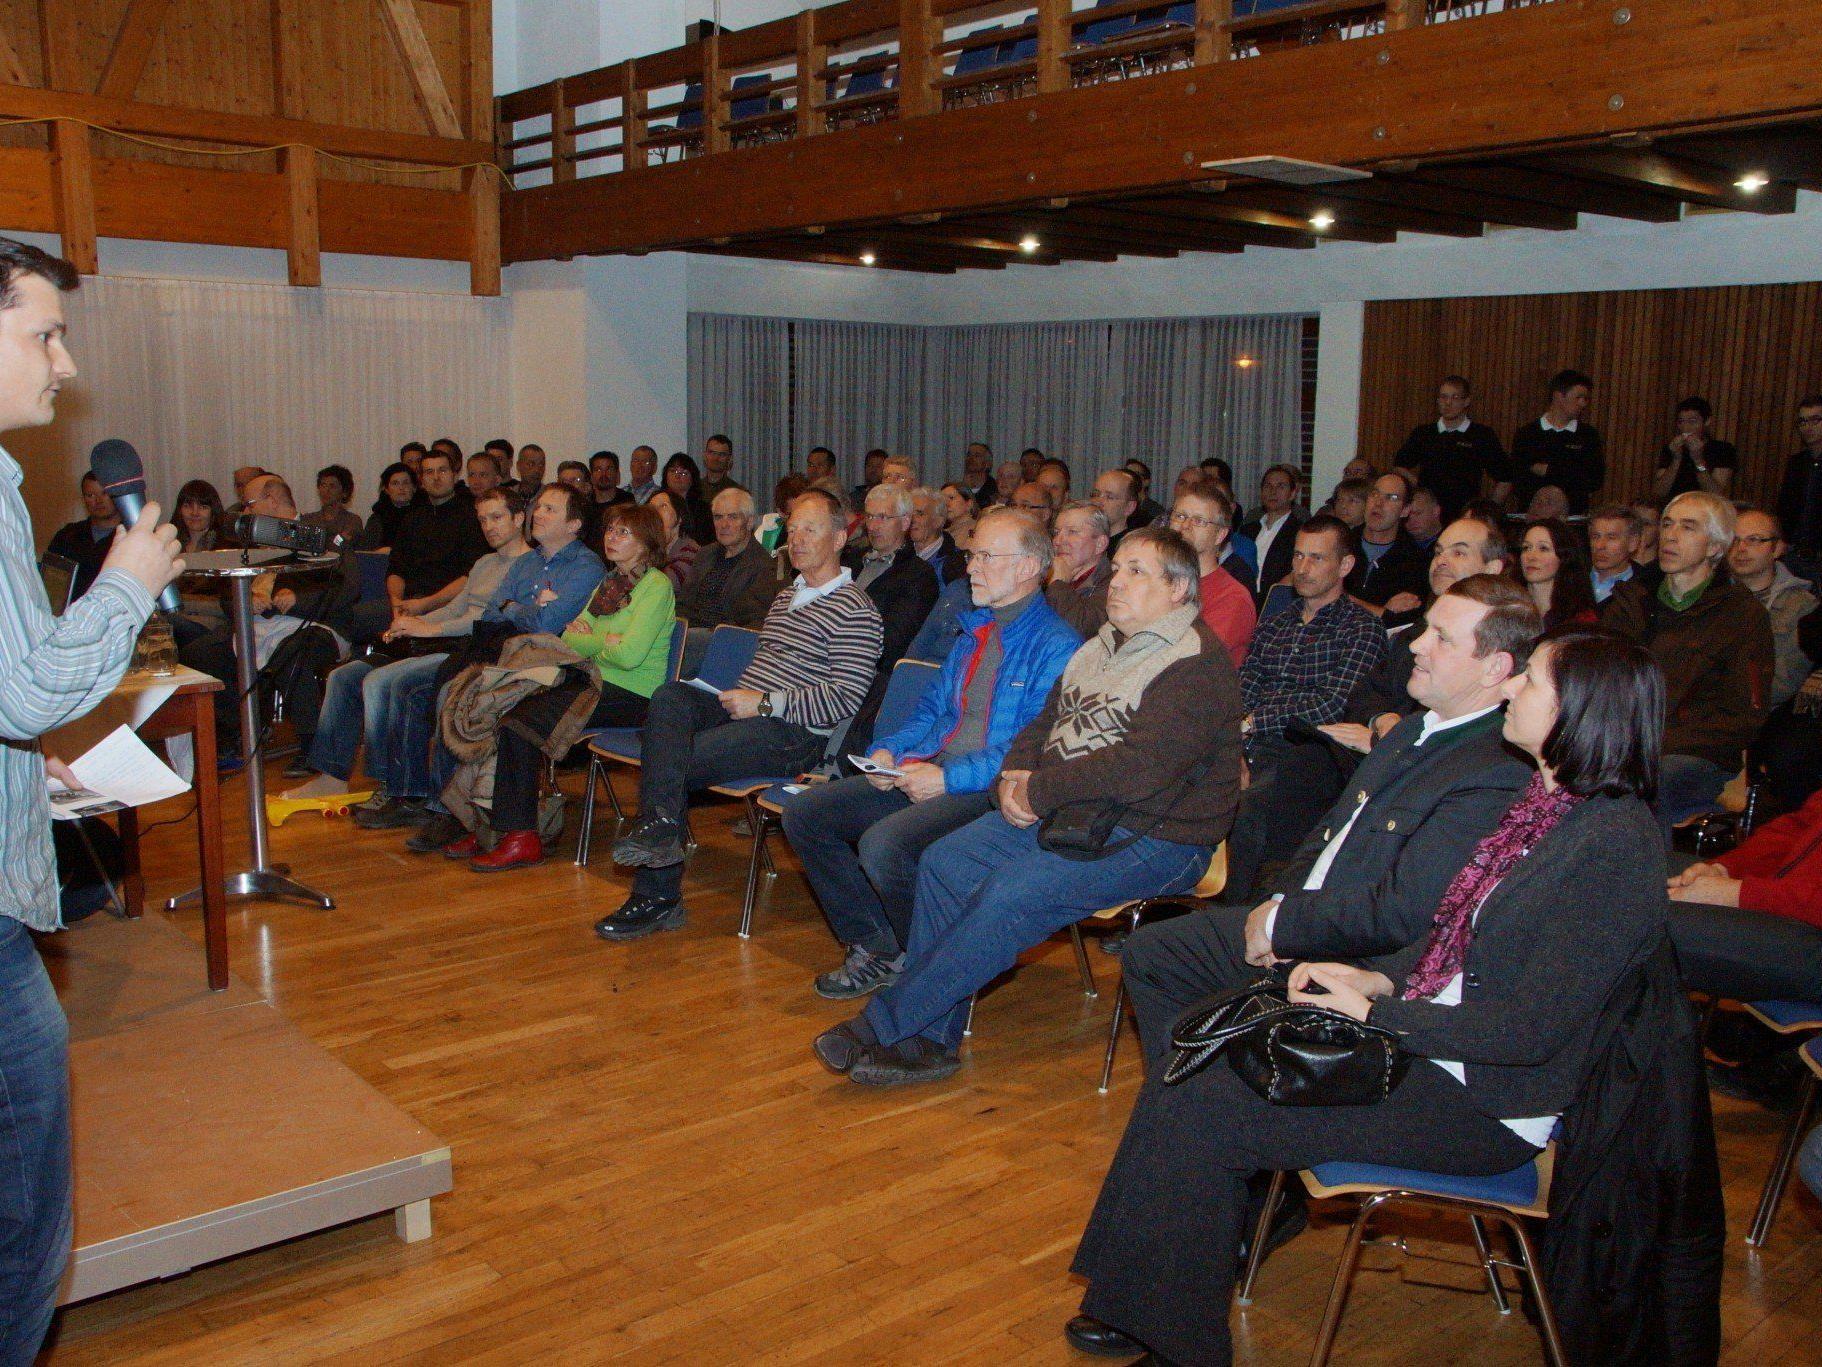 Blumeneggs Energiekoordinator Andreas Bertel war über das Besucherinteresse überrascht.